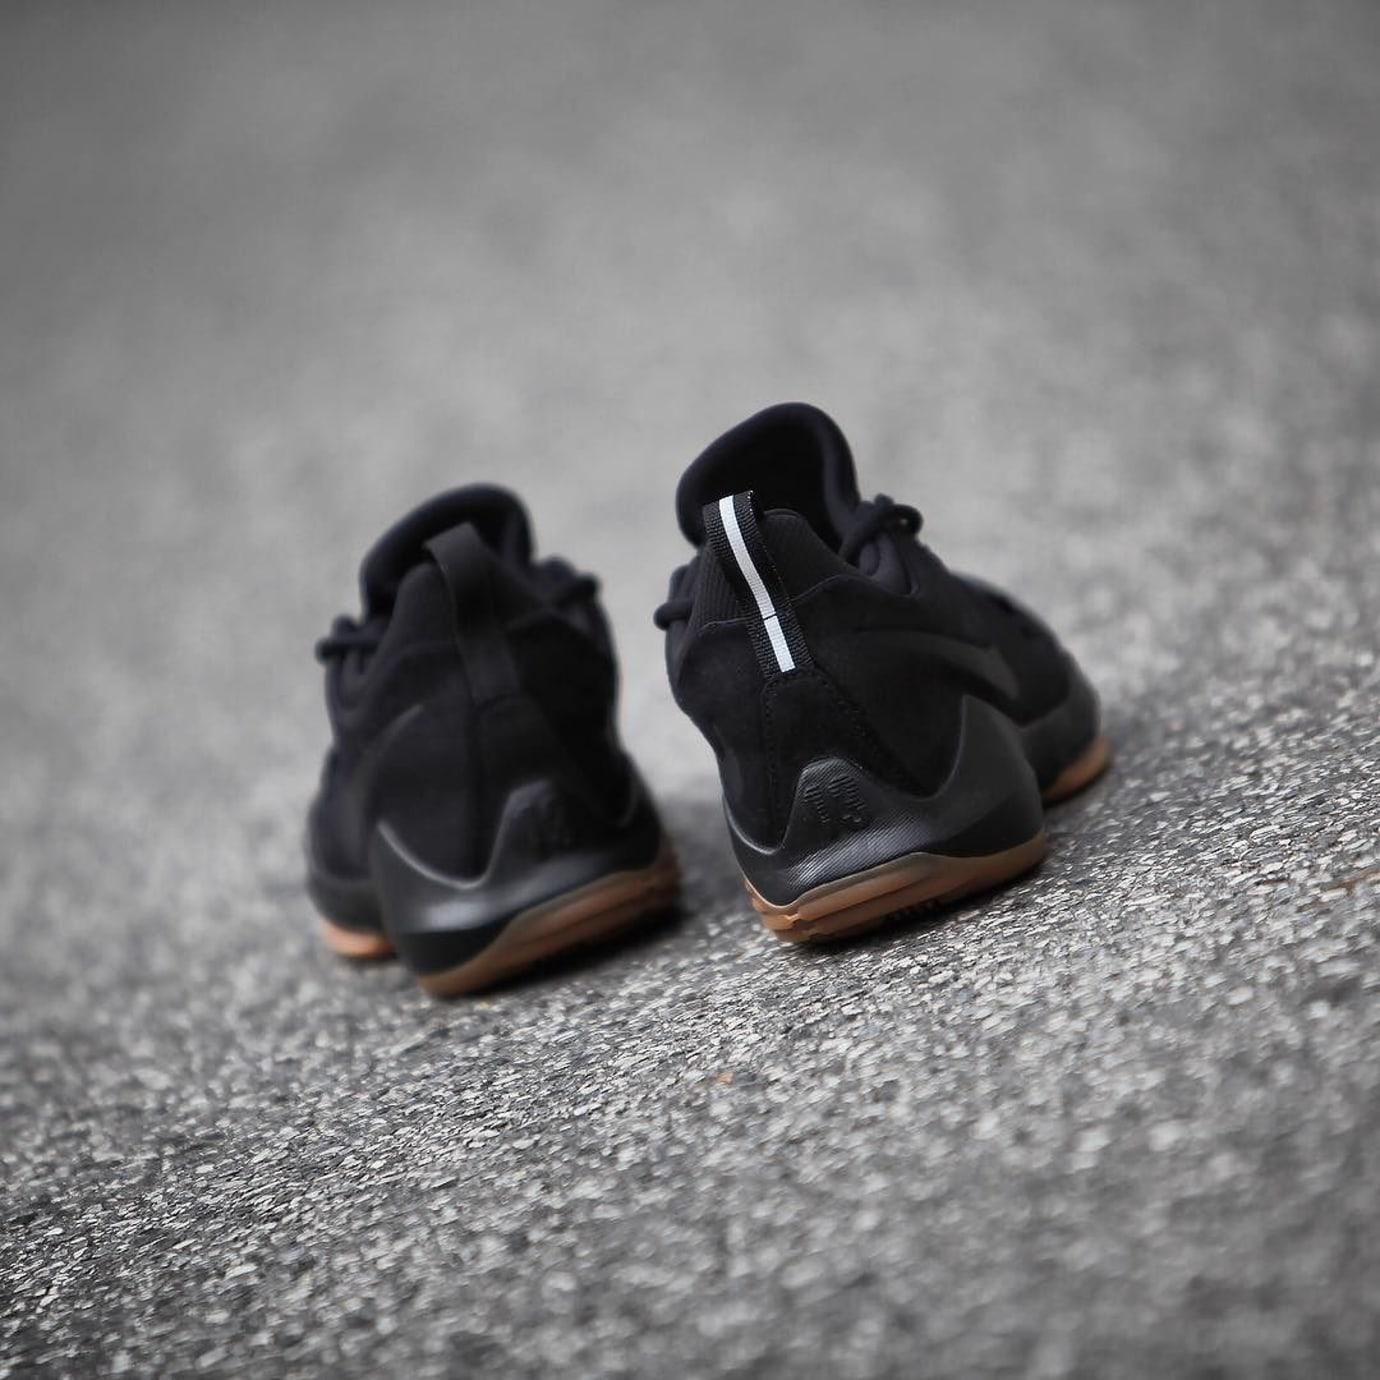 Nike PG1 Black Gum Release Date 878627-004 (4)